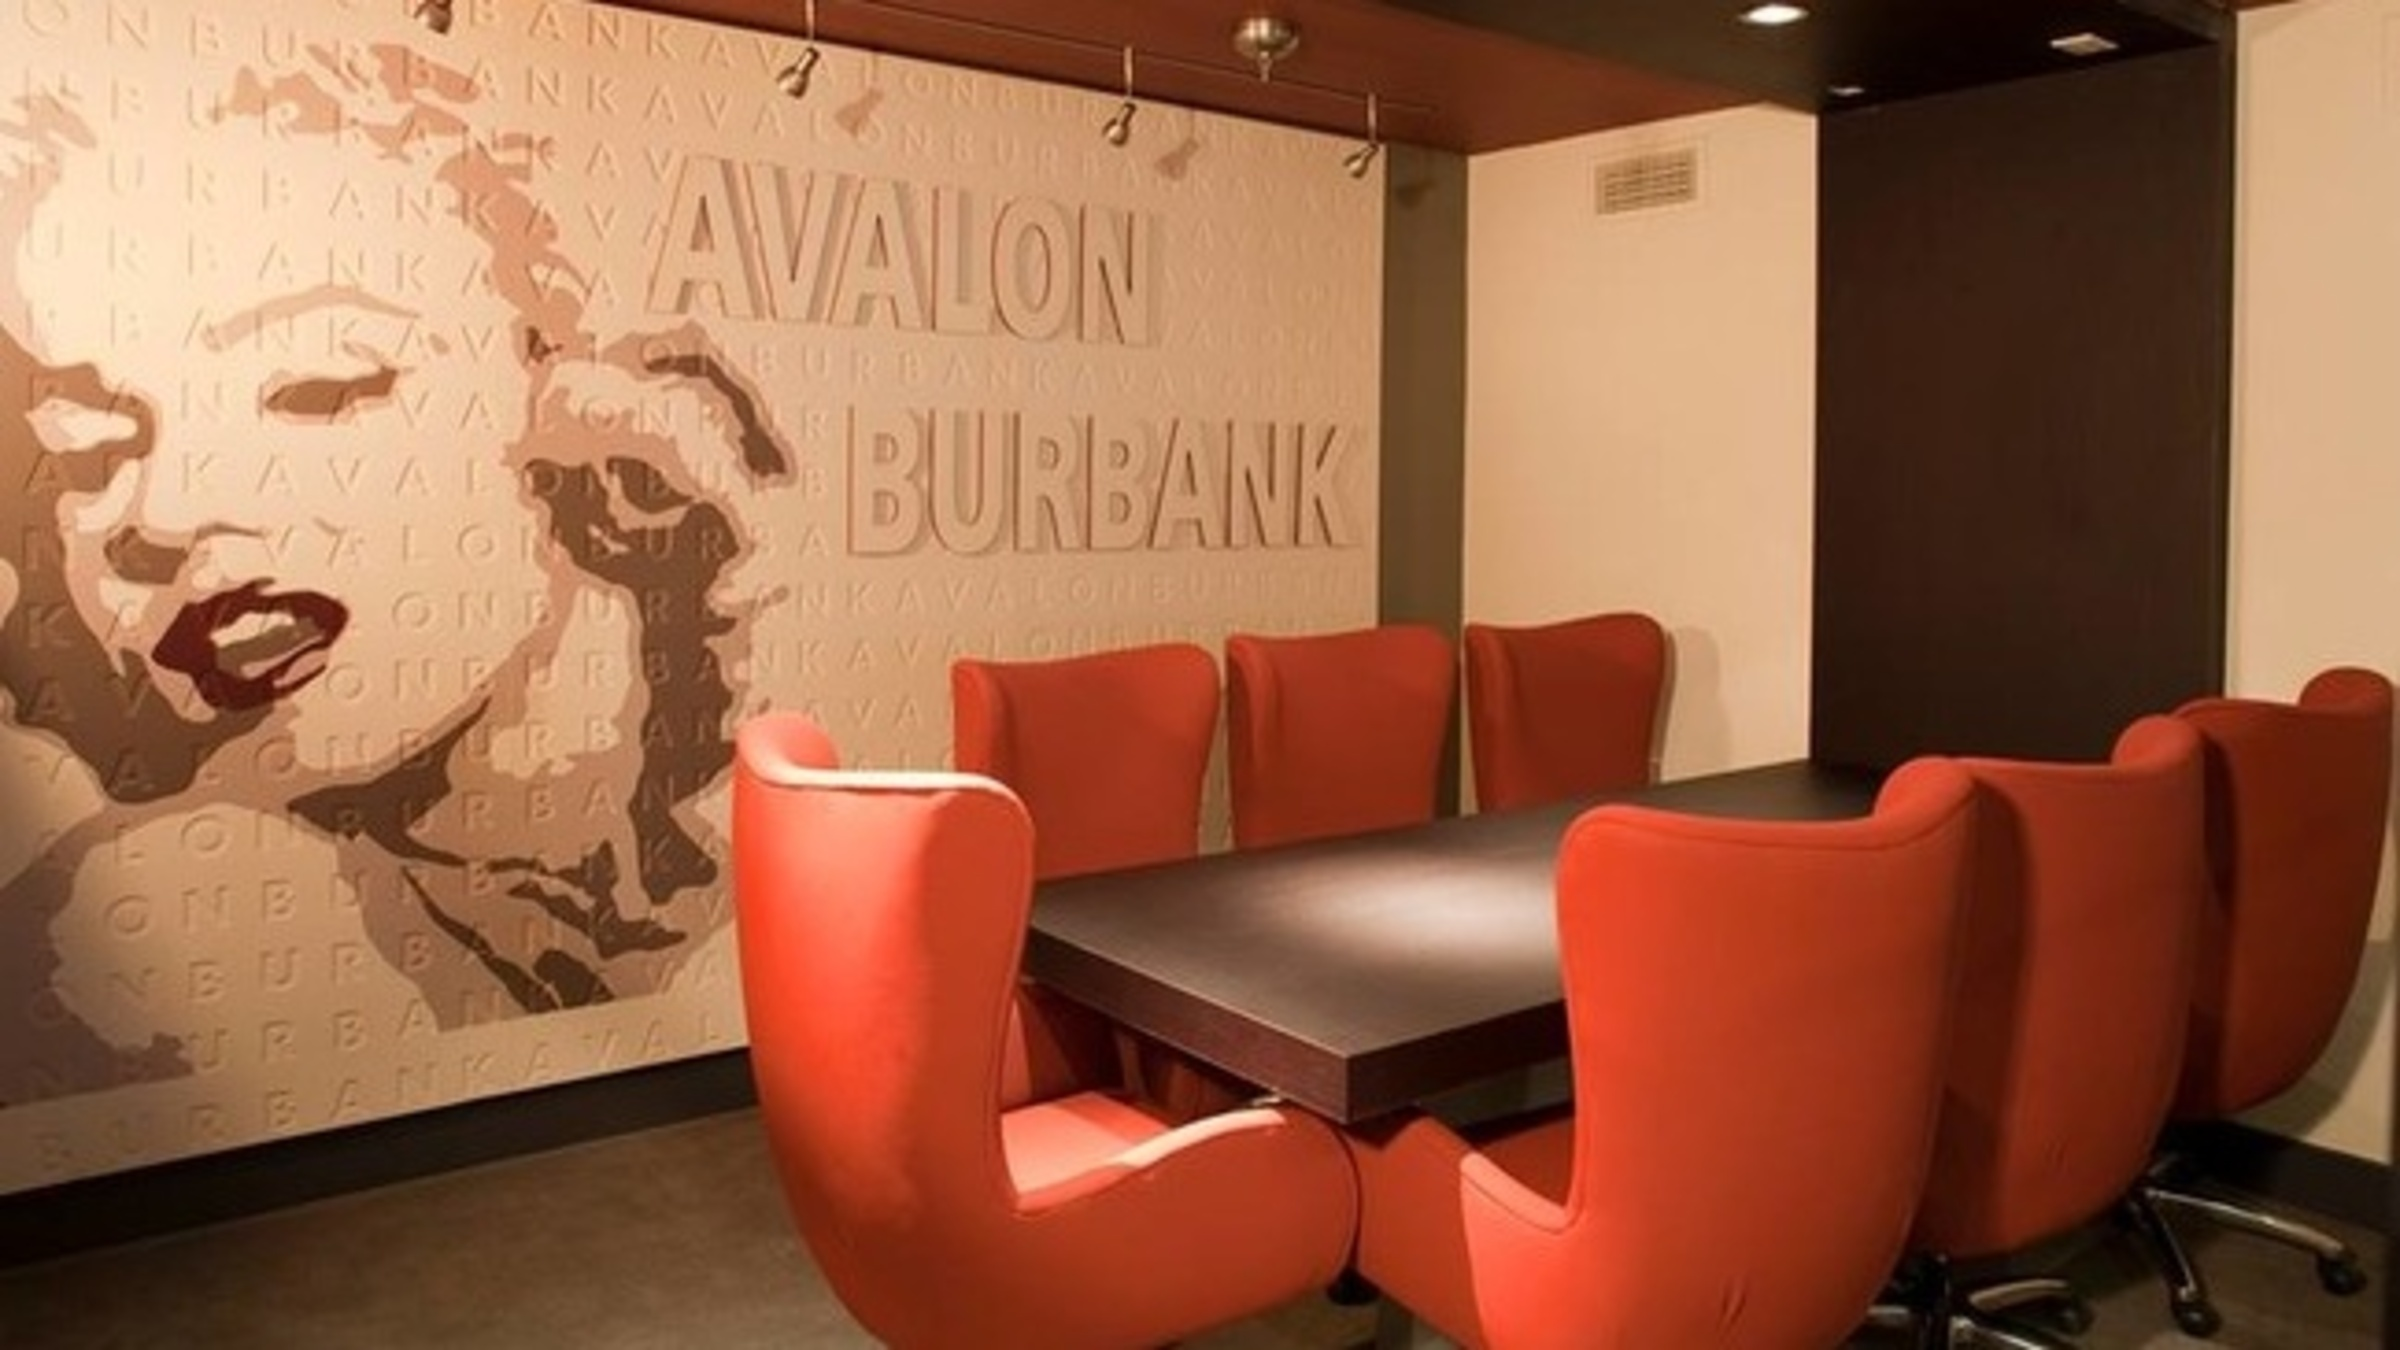 Avalon Burbank